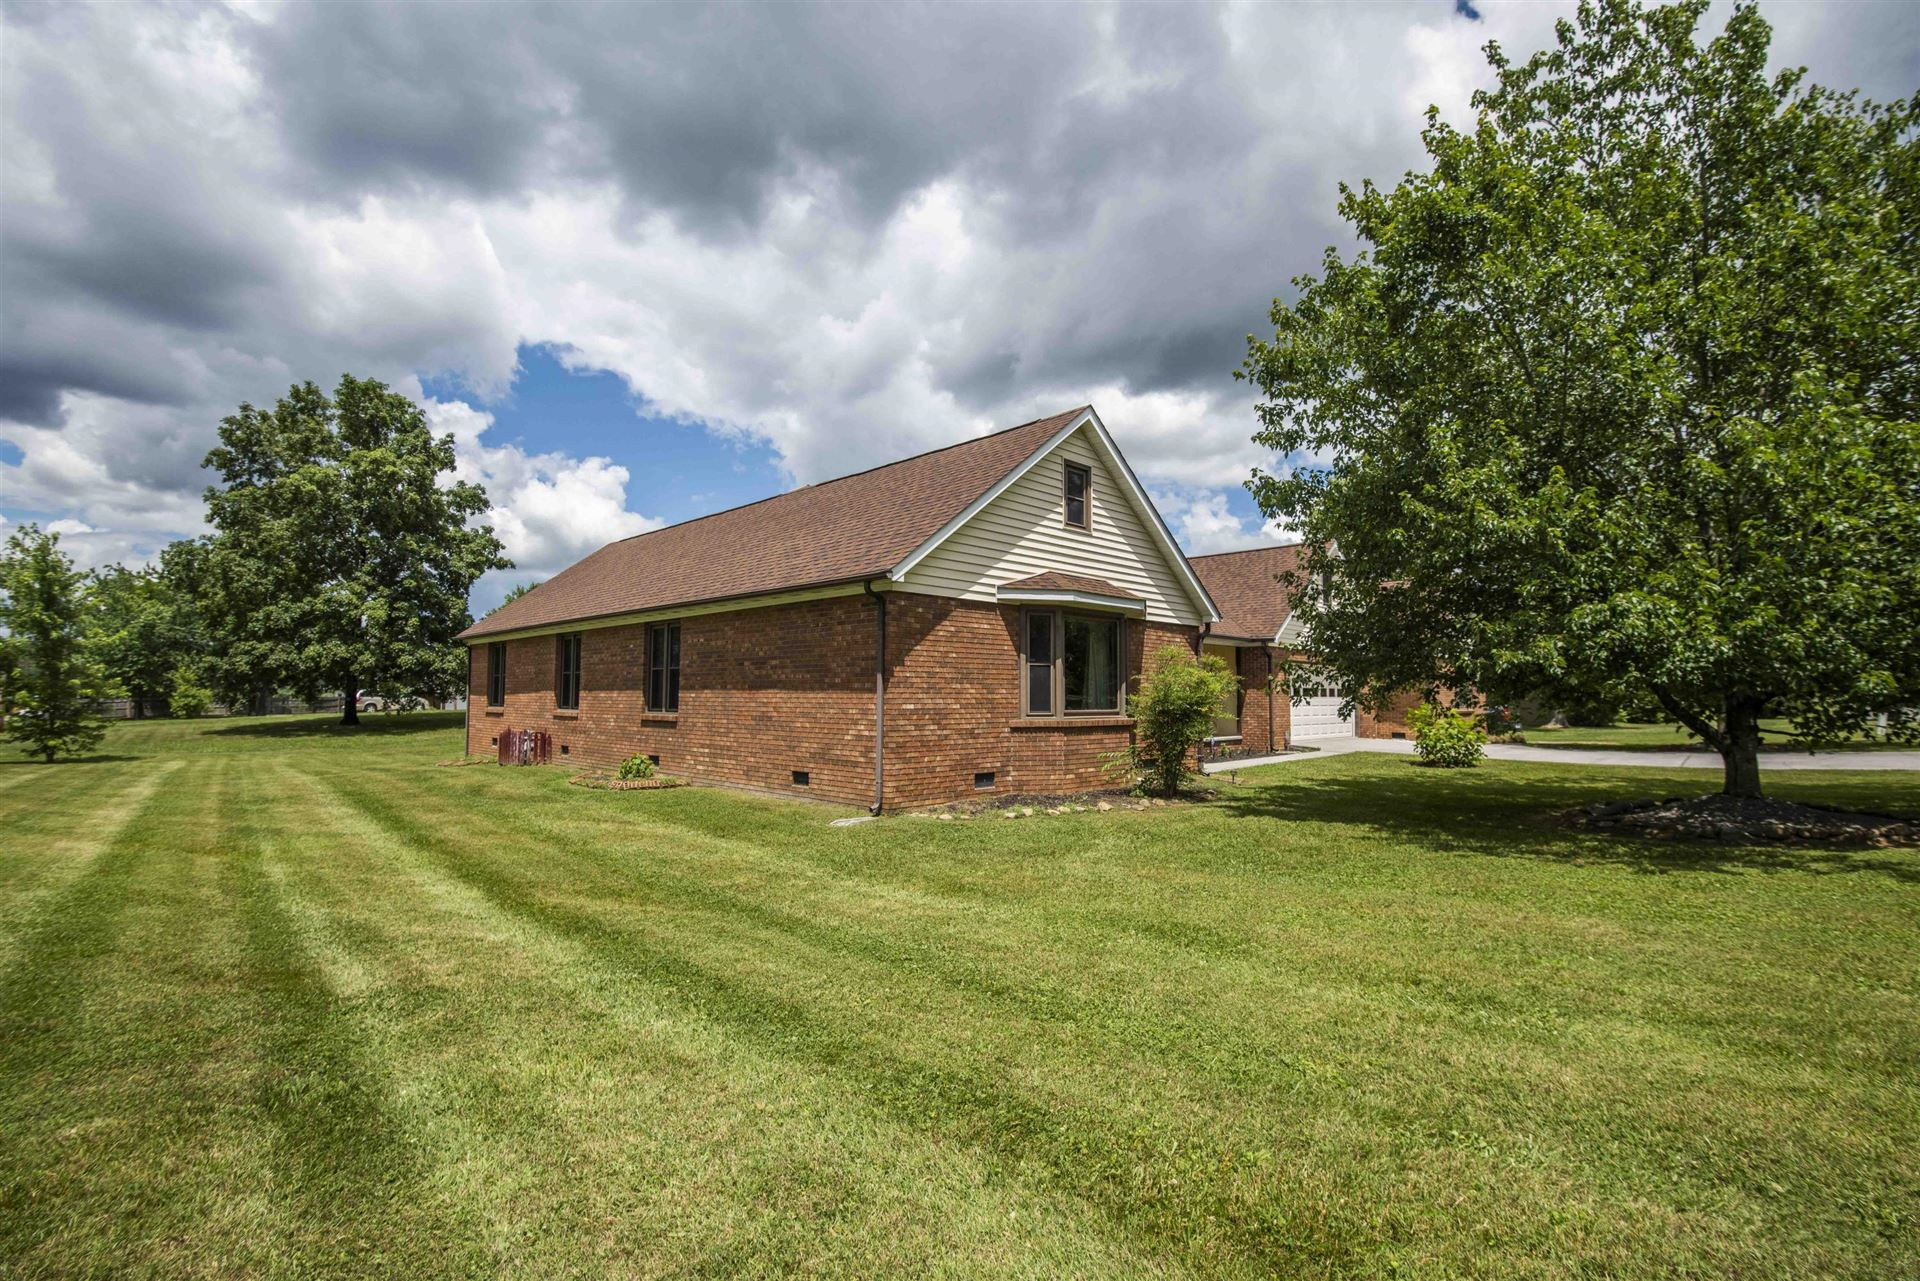 Photo of 1300 Beechview Drive Drive, Sevierville, TN 37862 (MLS # 1120744)